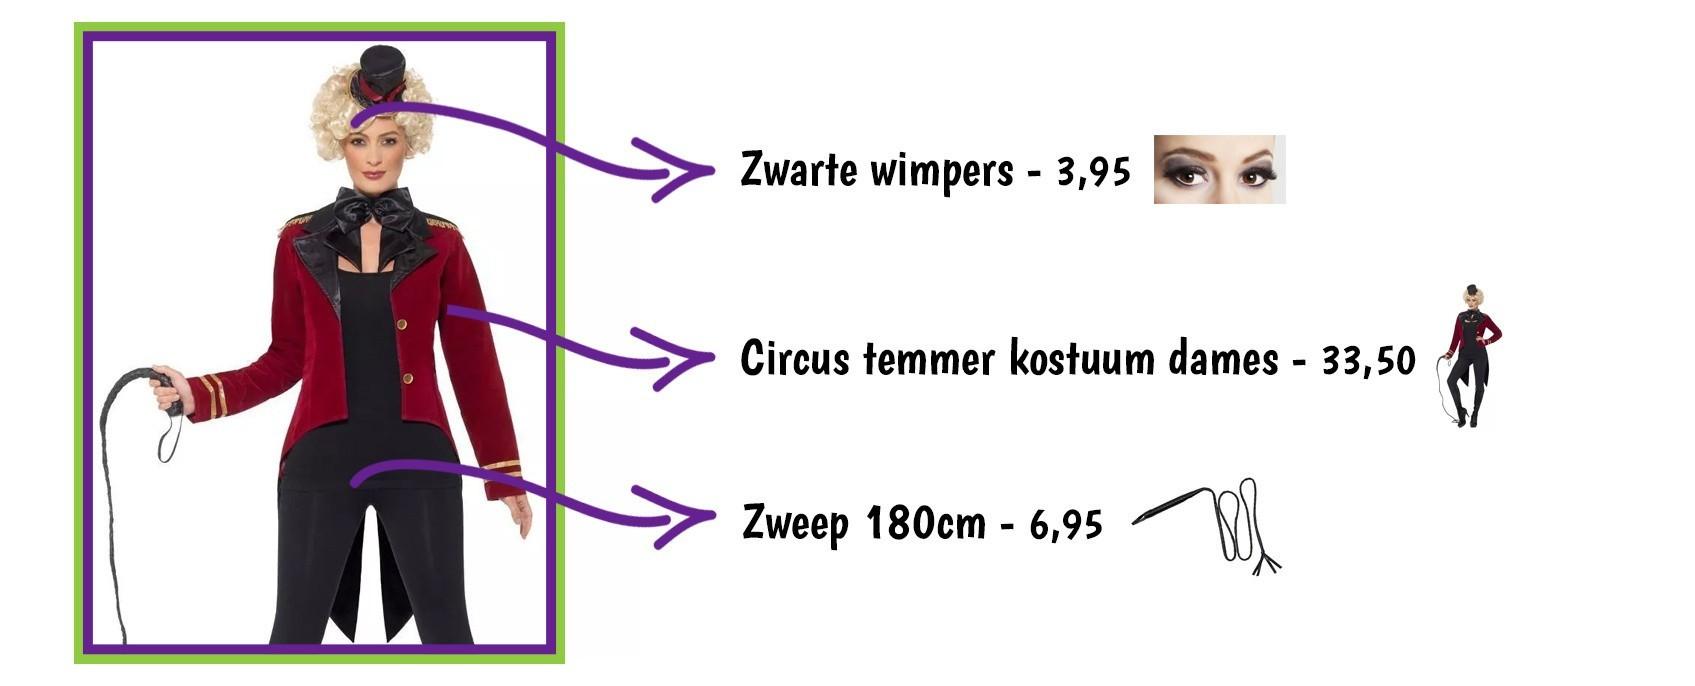 Circus temmer kostuum dames